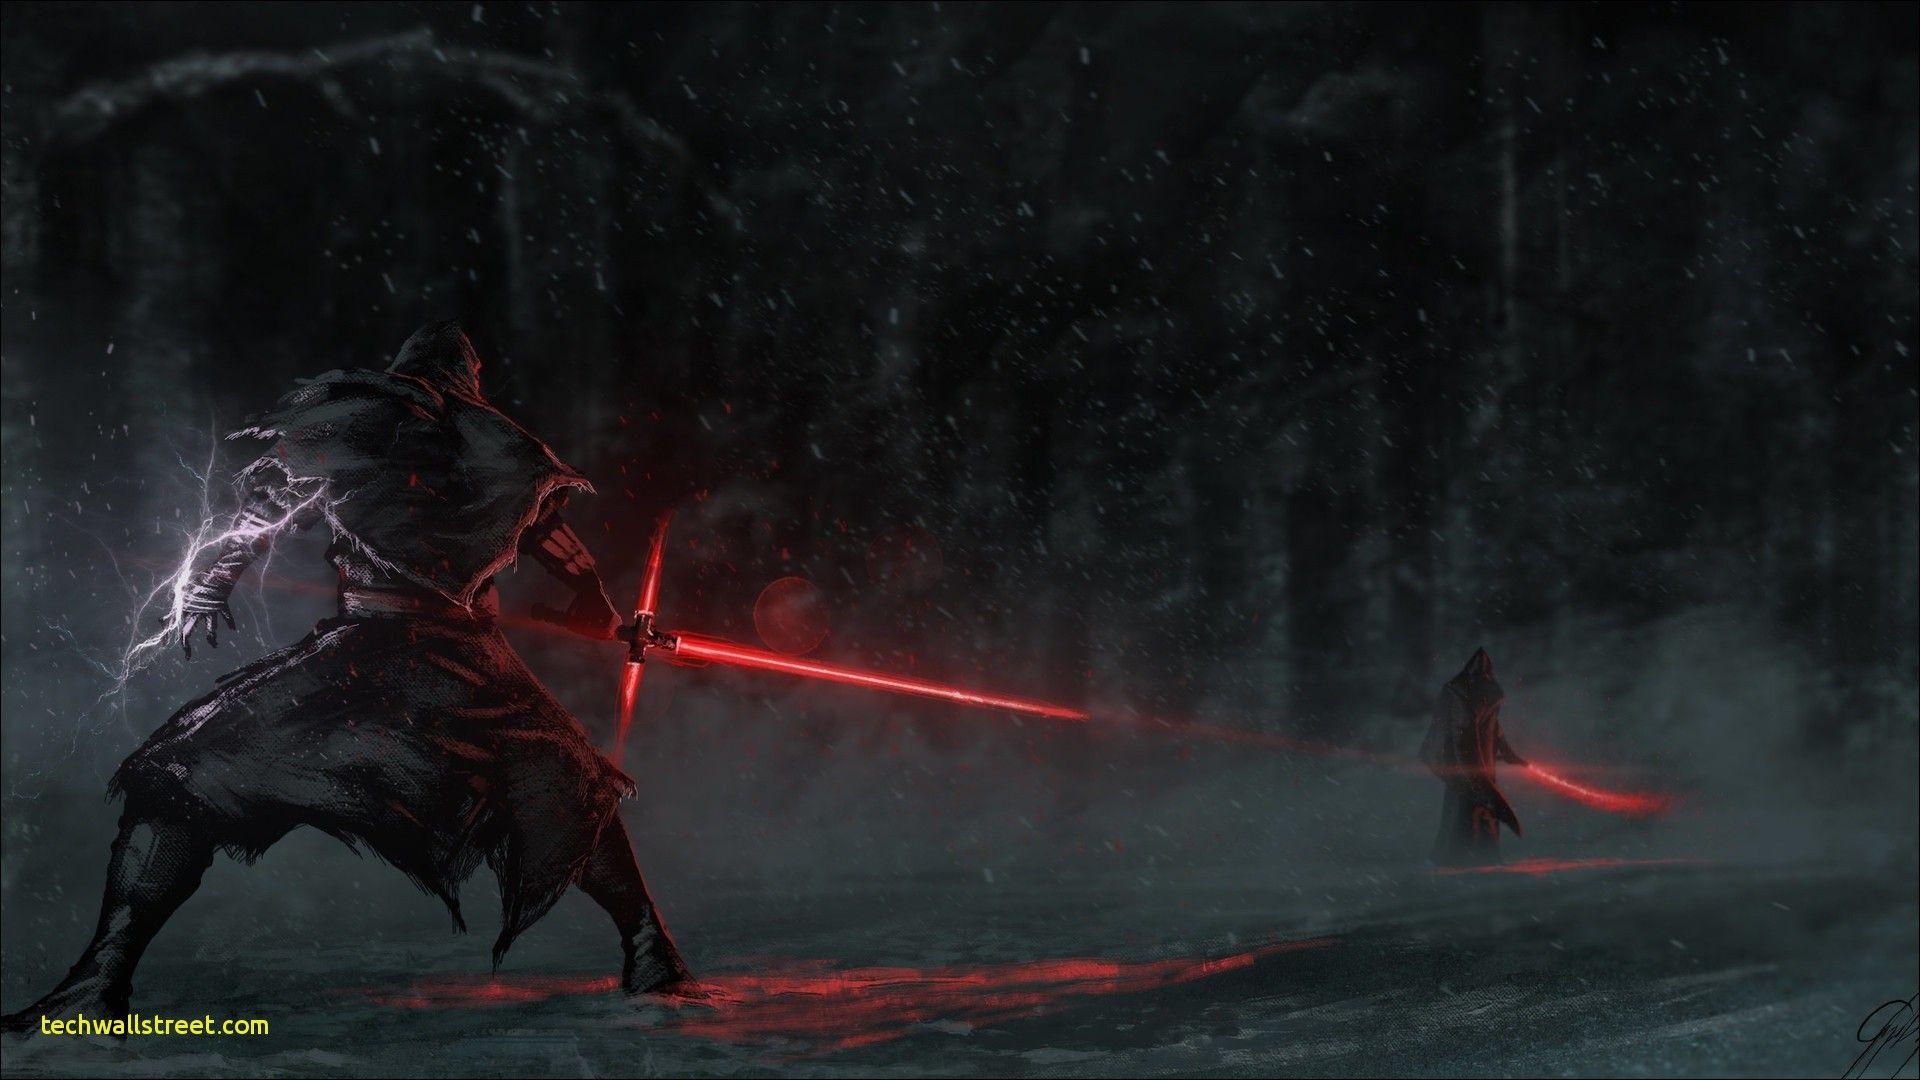 Beautiful Anthem Desktop Wallpaper Star Wars Darth Vader Chewbacca